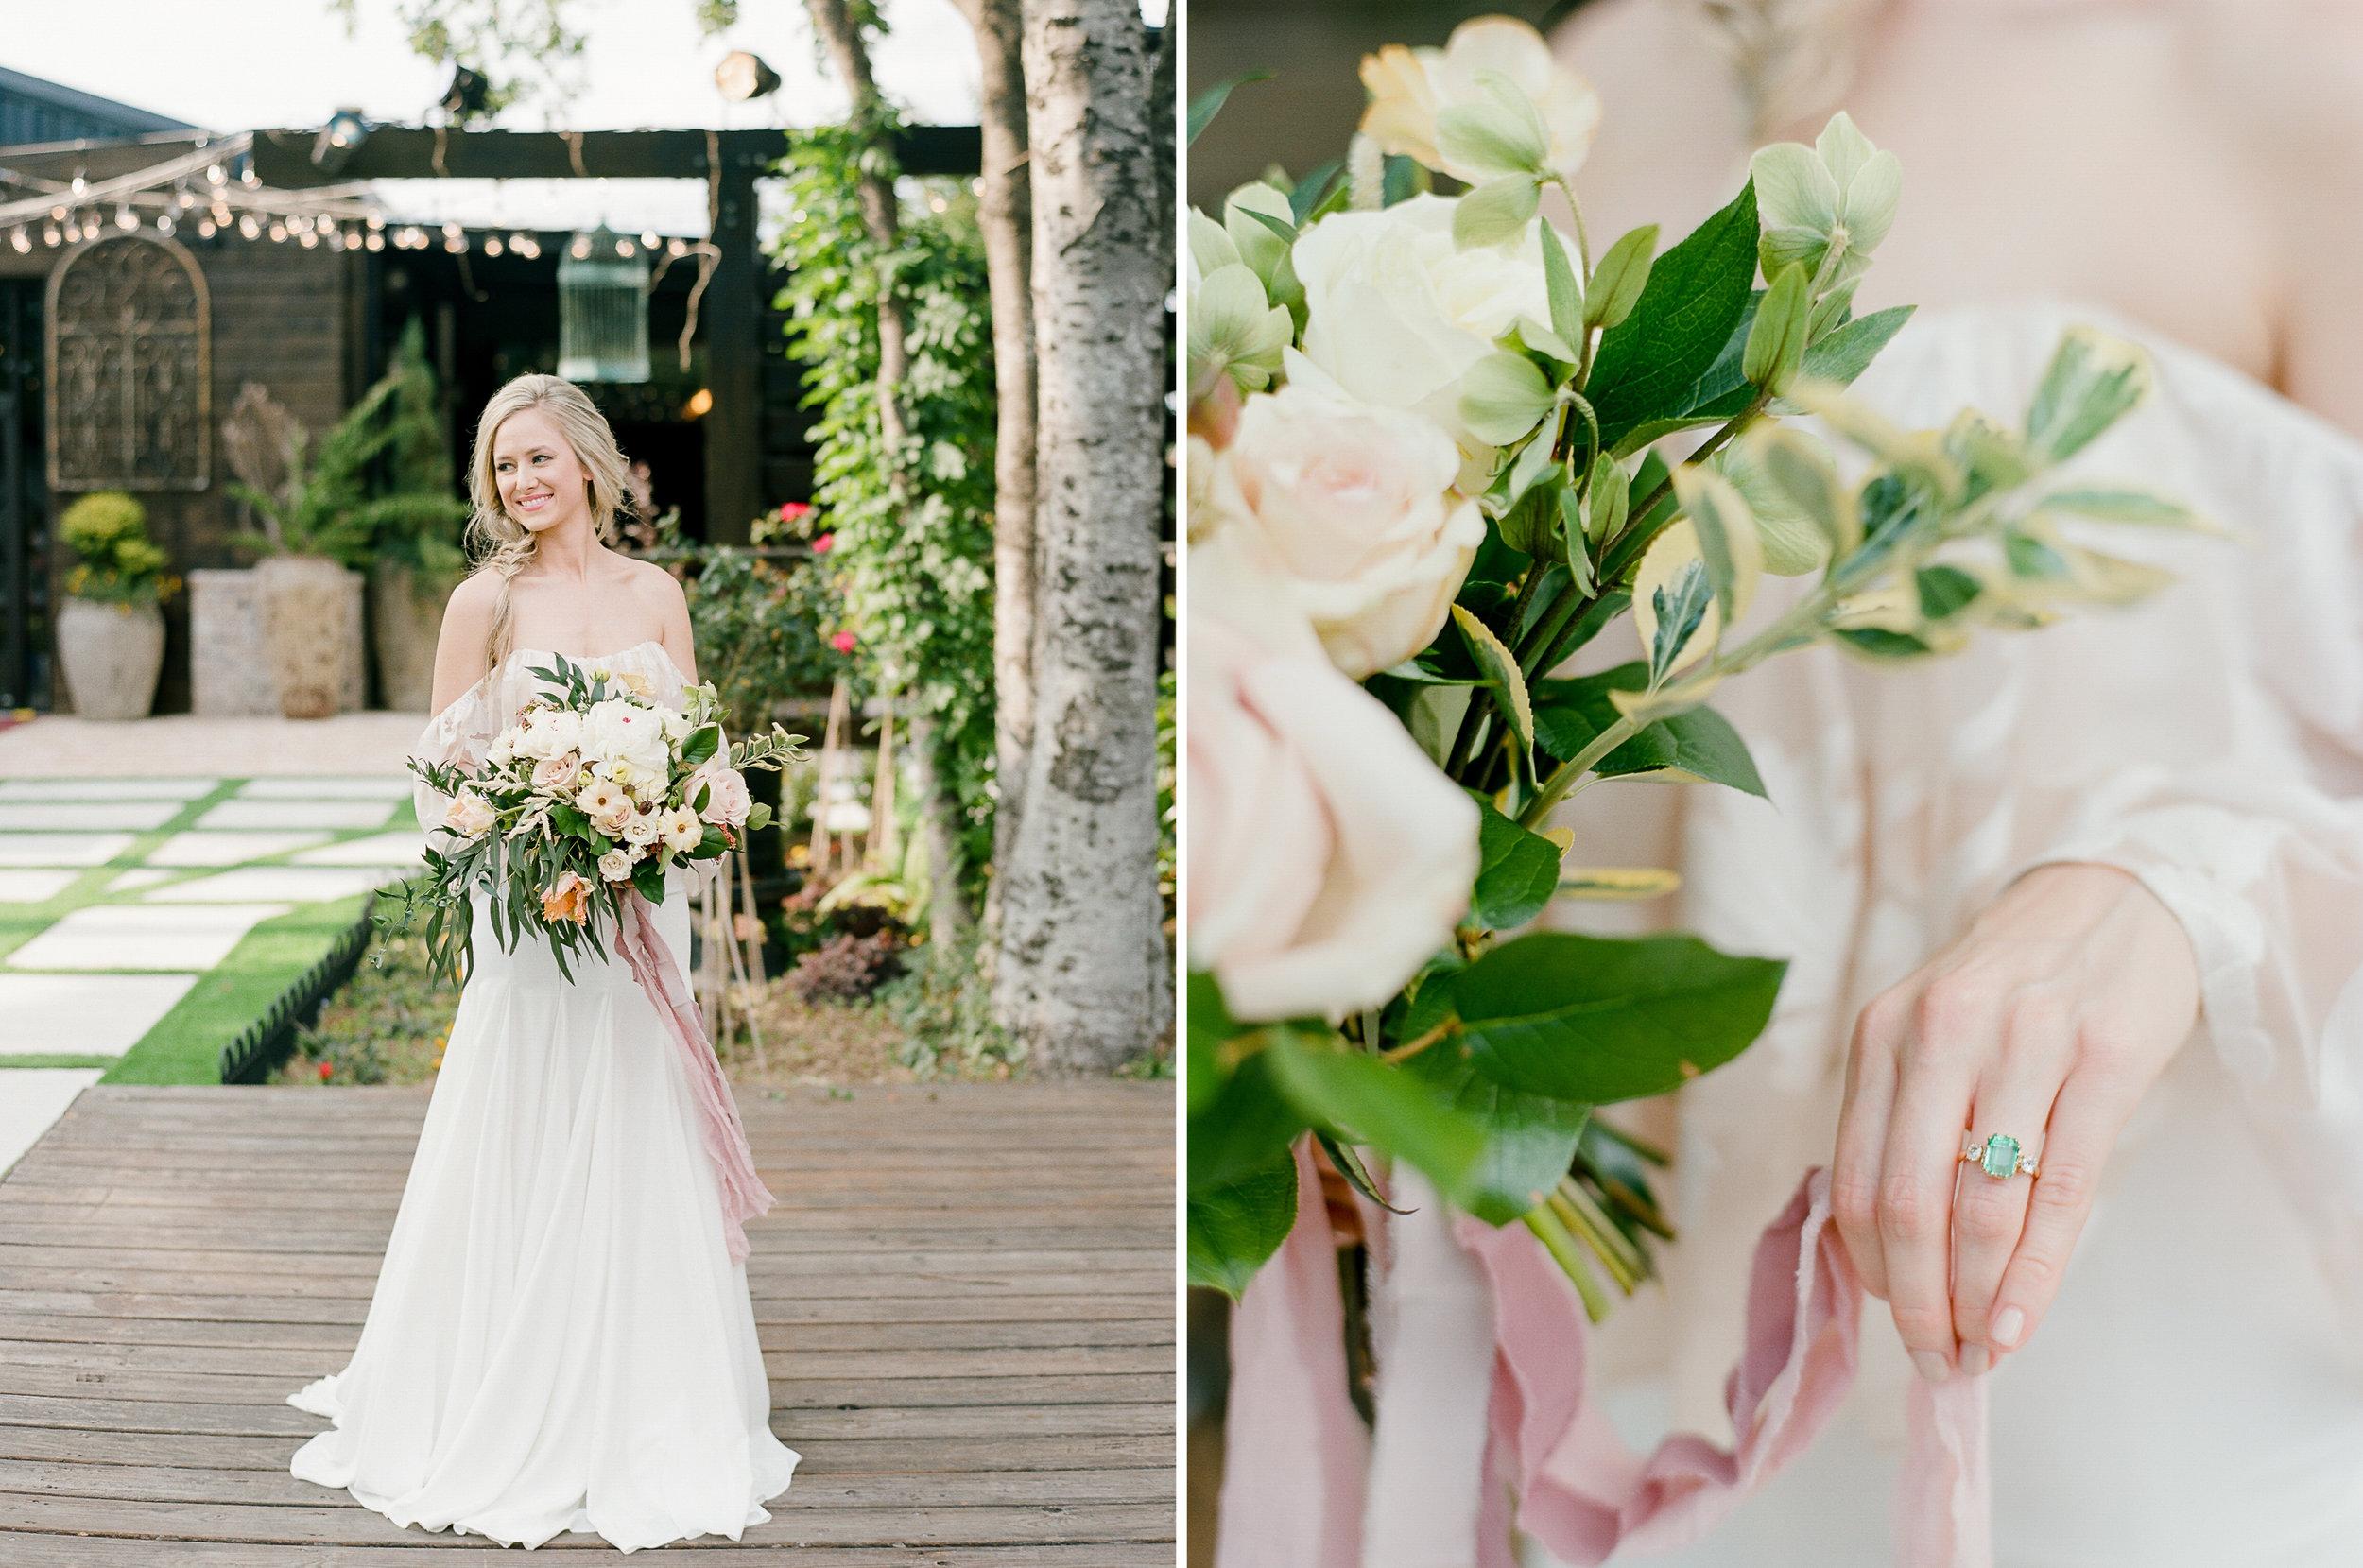 Houston-Wedding-Photographer-Fine-Art-Film-Destination-Style-Me-Pretty-Austin-Dallas-New-Orleans-Dana-Fernandez-Photography-102.jpg